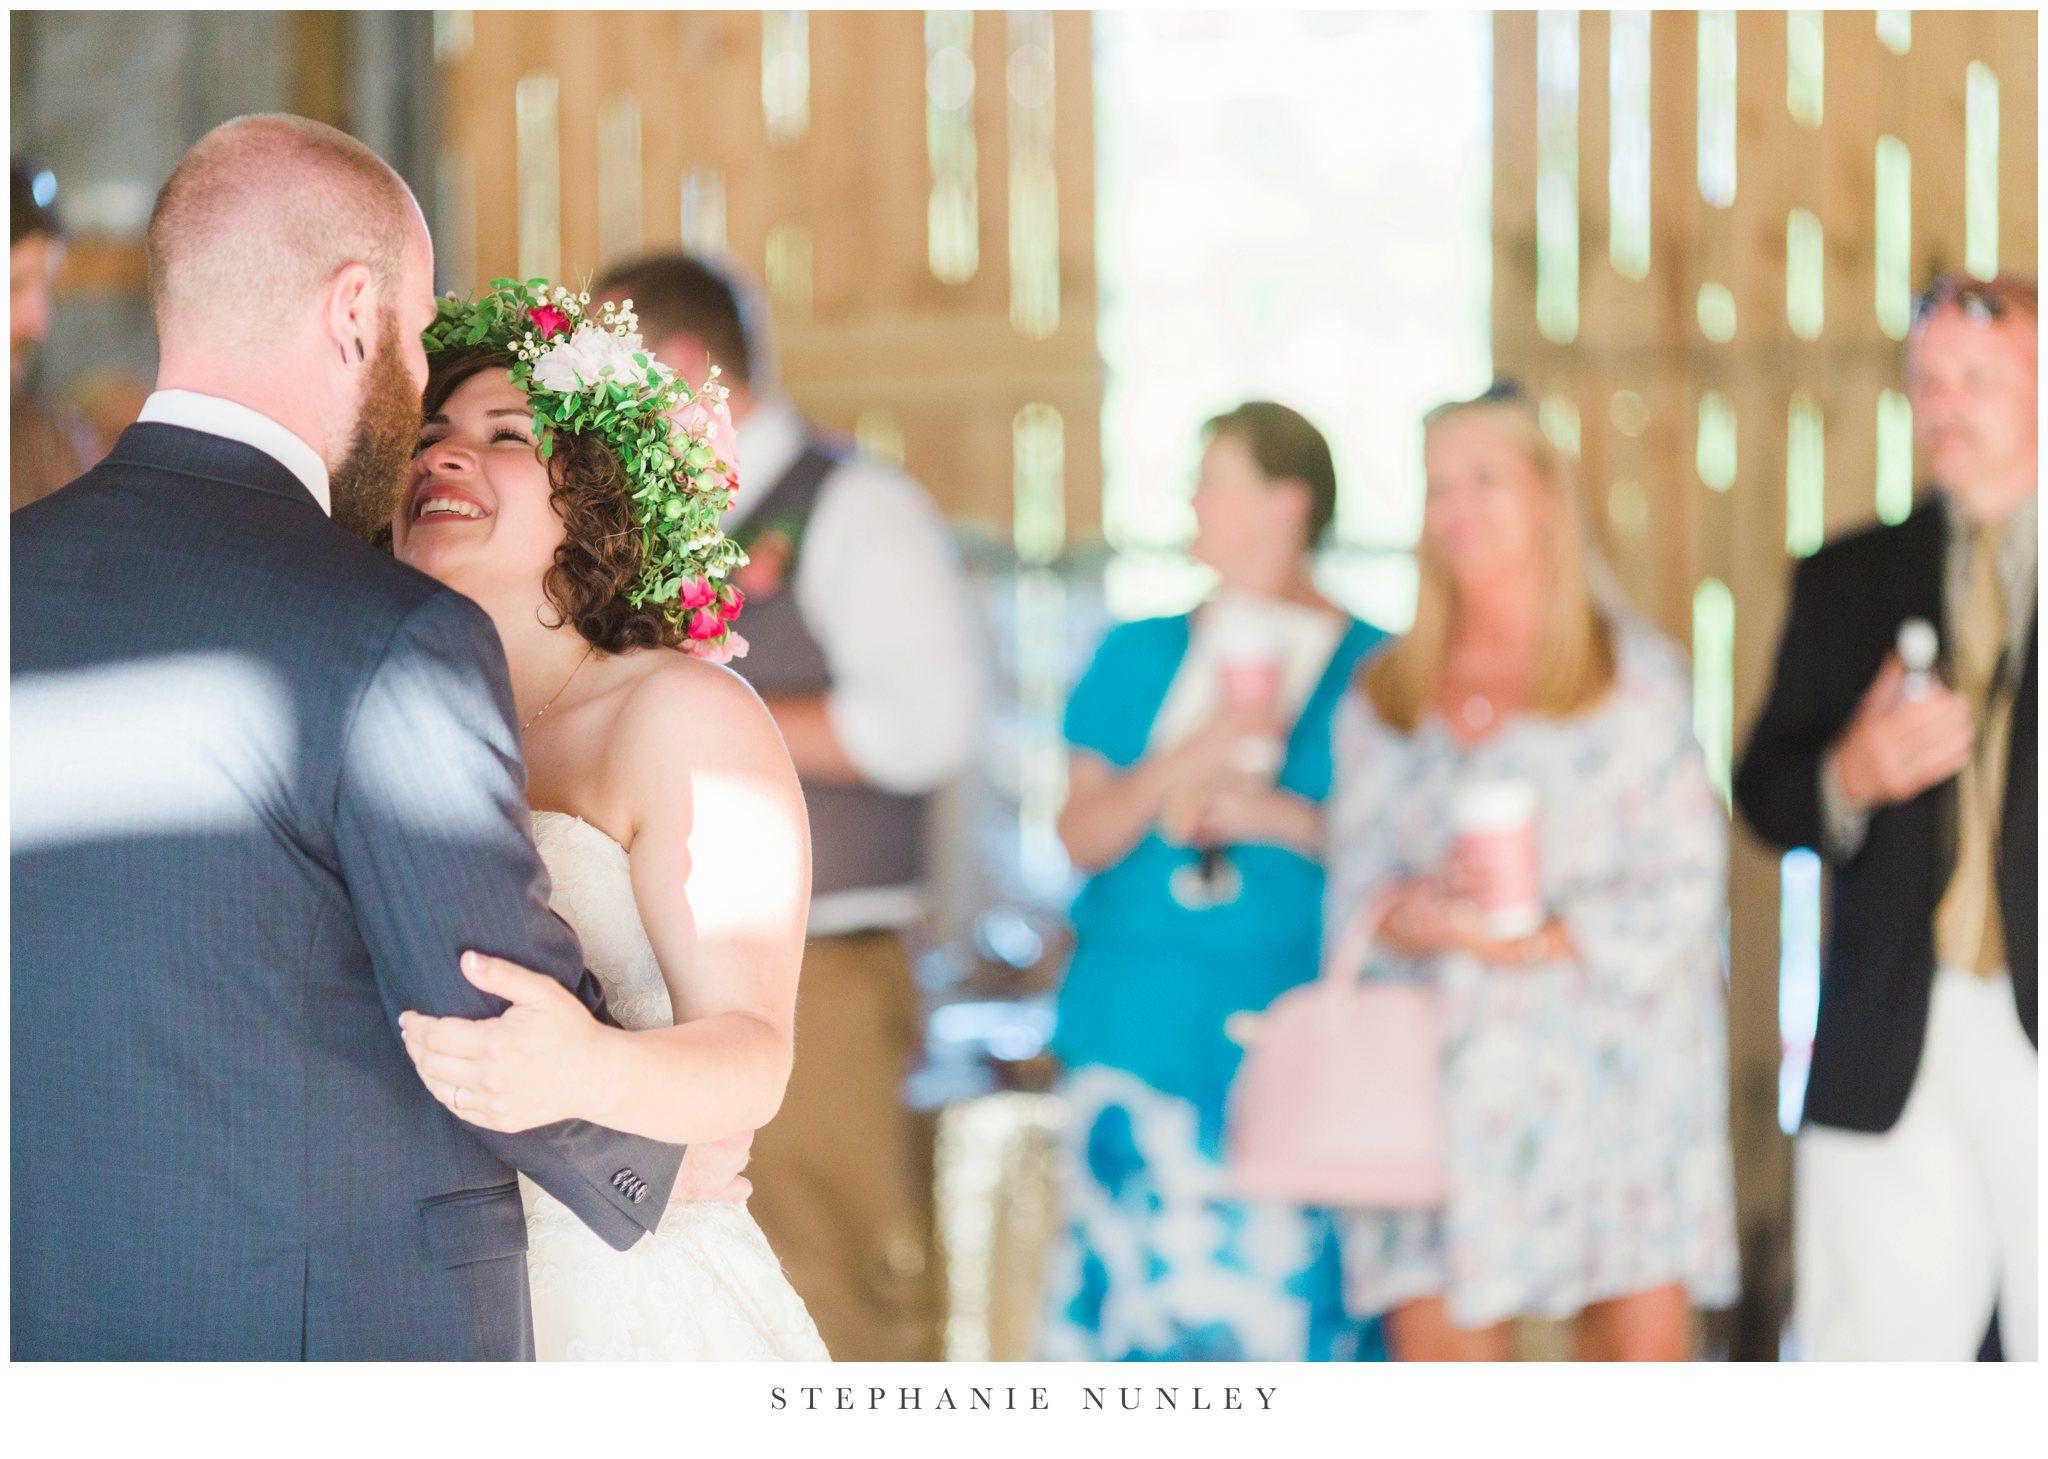 romantic-outdoor-wedding-with-flower-crown-0133.jpg